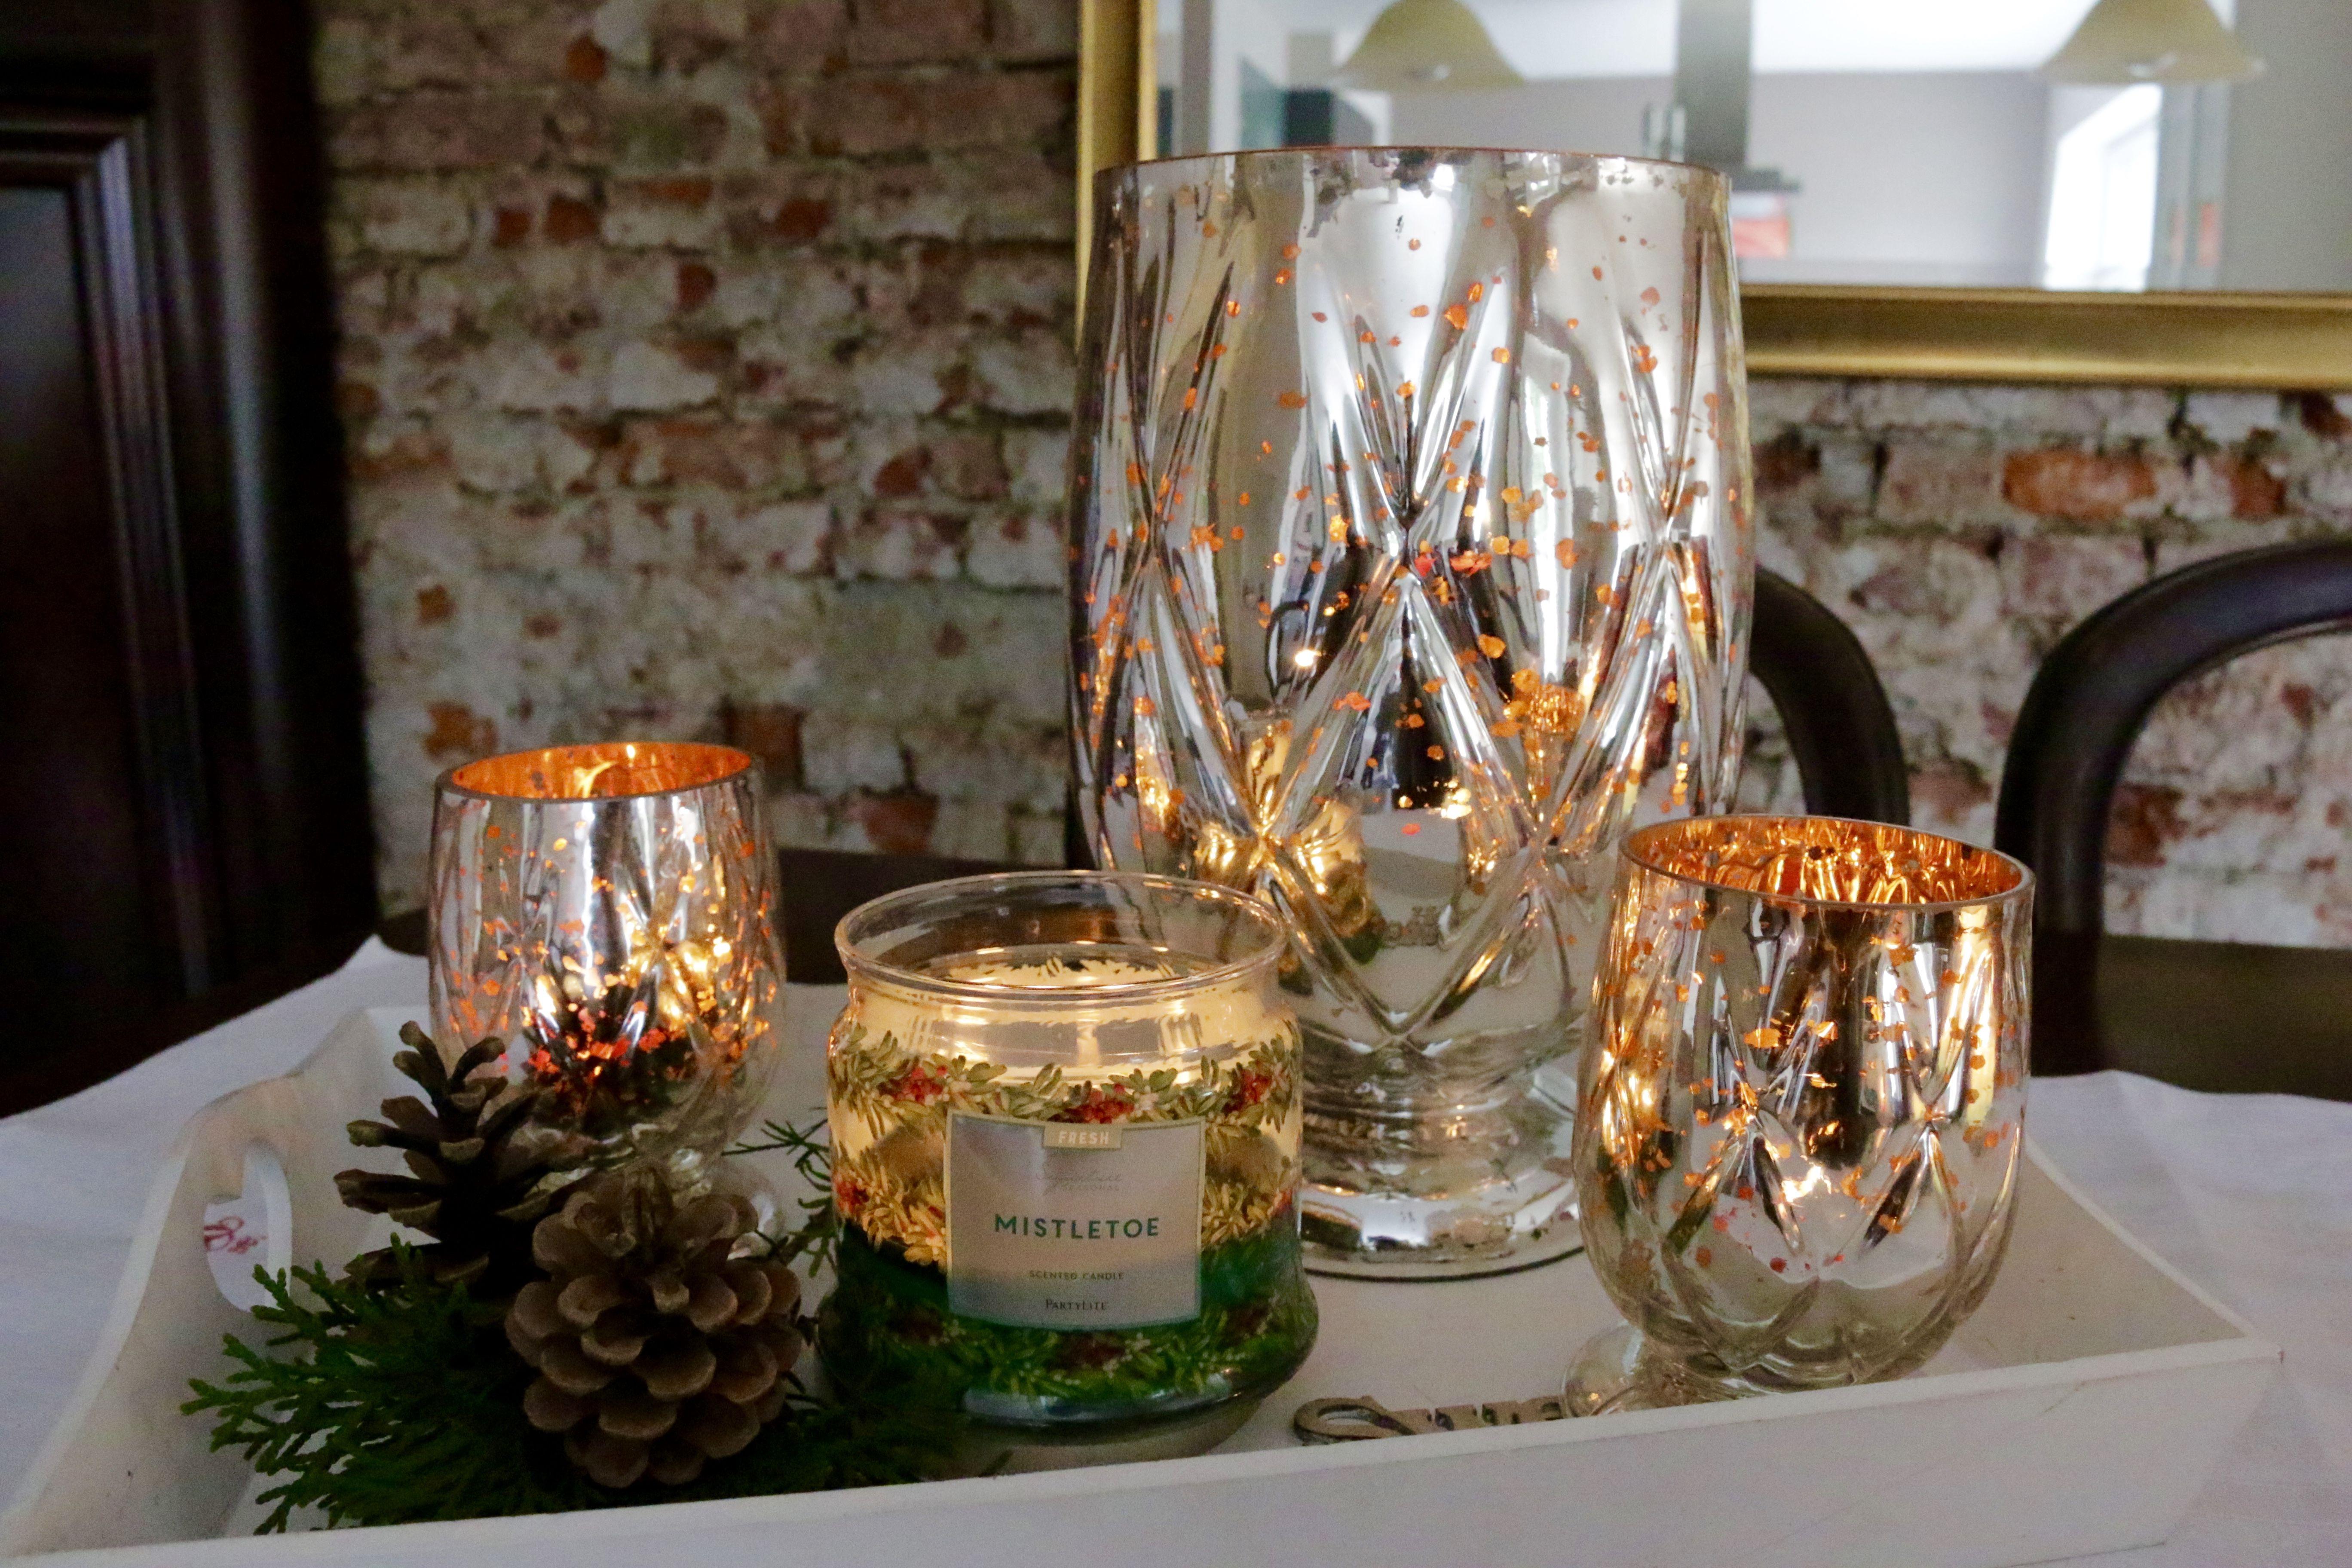 Shabby Chic Deko Kerzen Tablett Ideen Kerzen Deko Haus Dekoration Kerzen